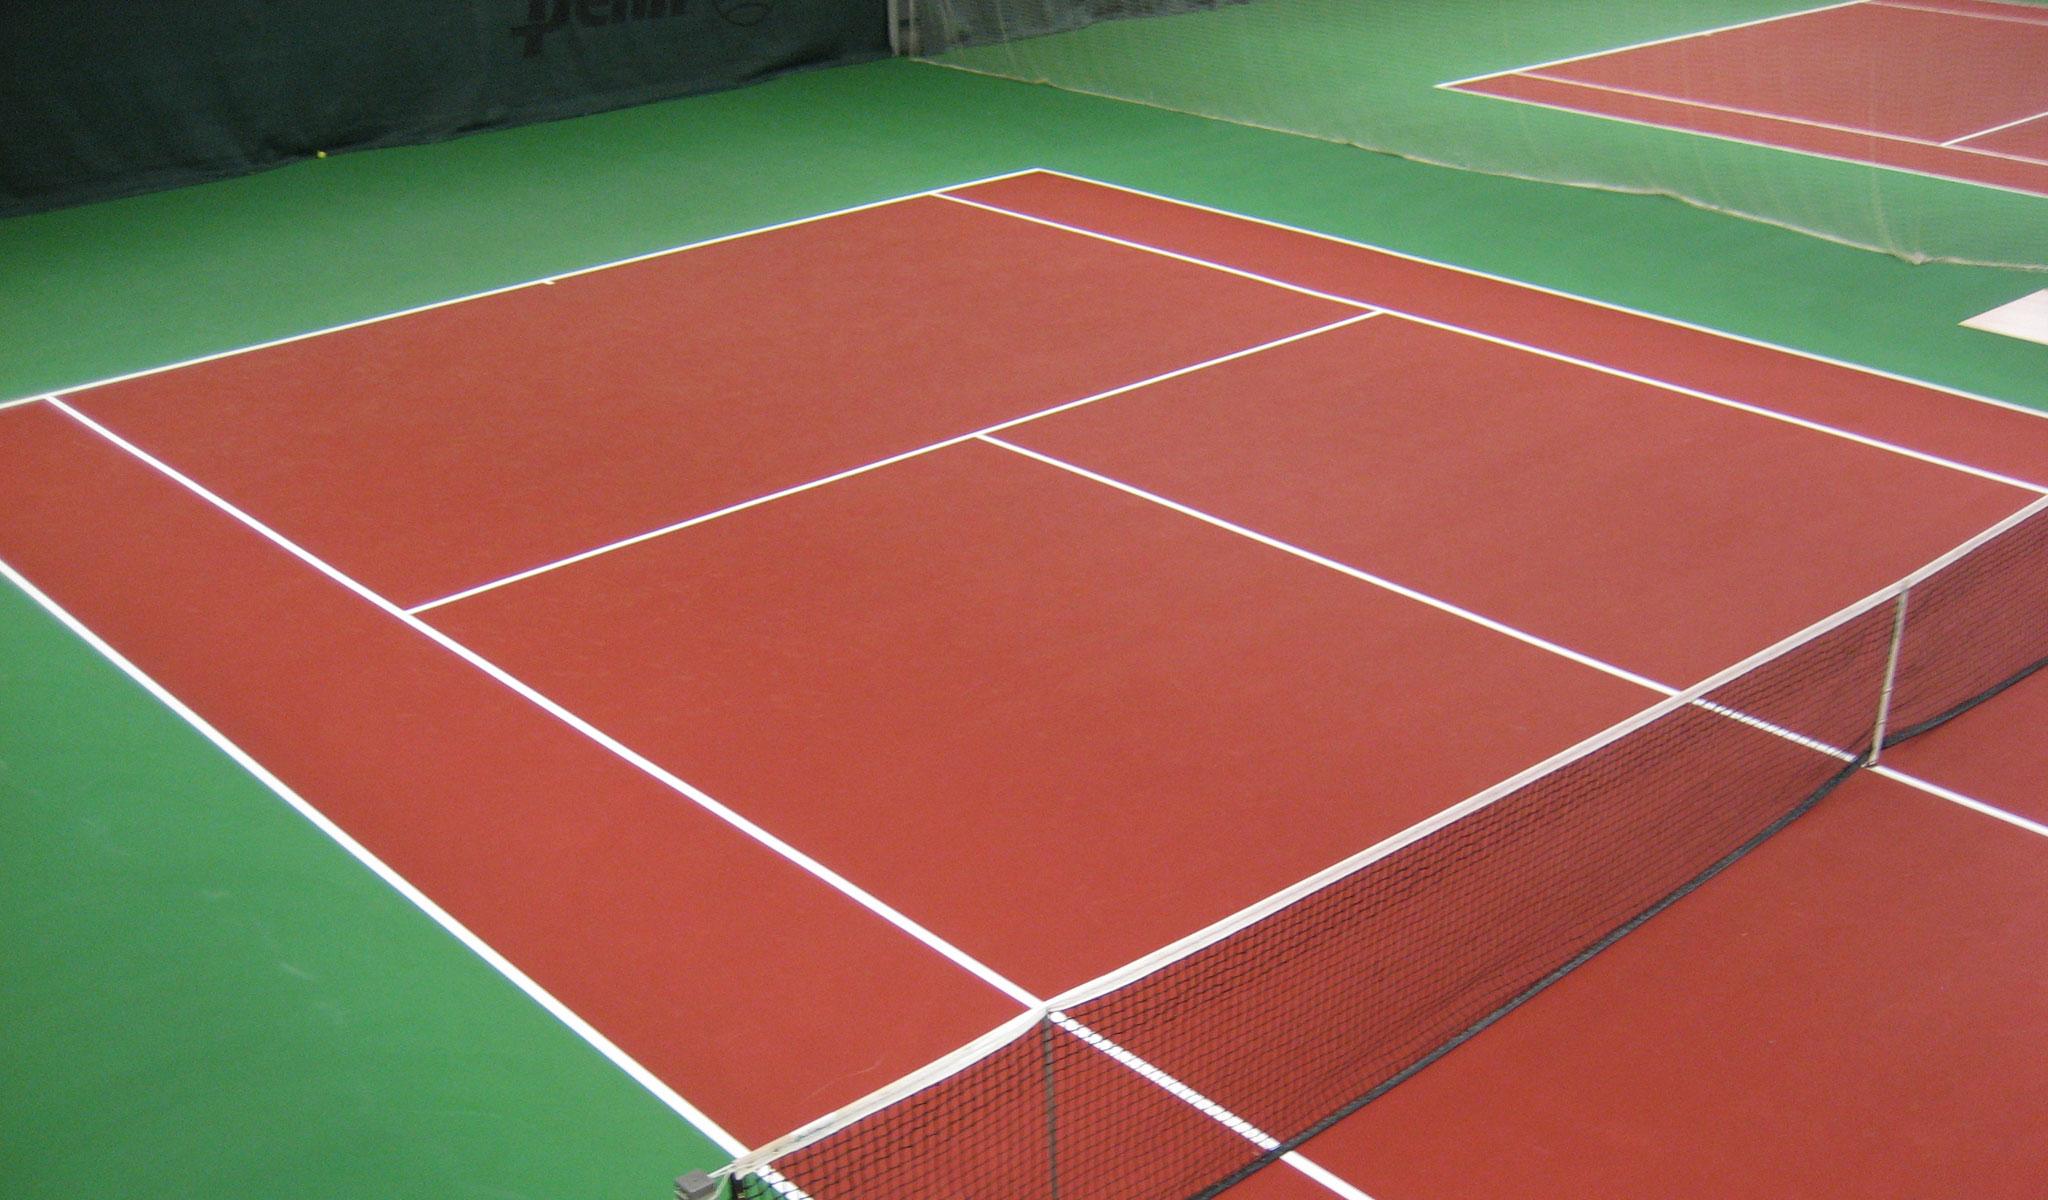 profelx tennisbana tennisbeläggning tennisunderlag från unisport